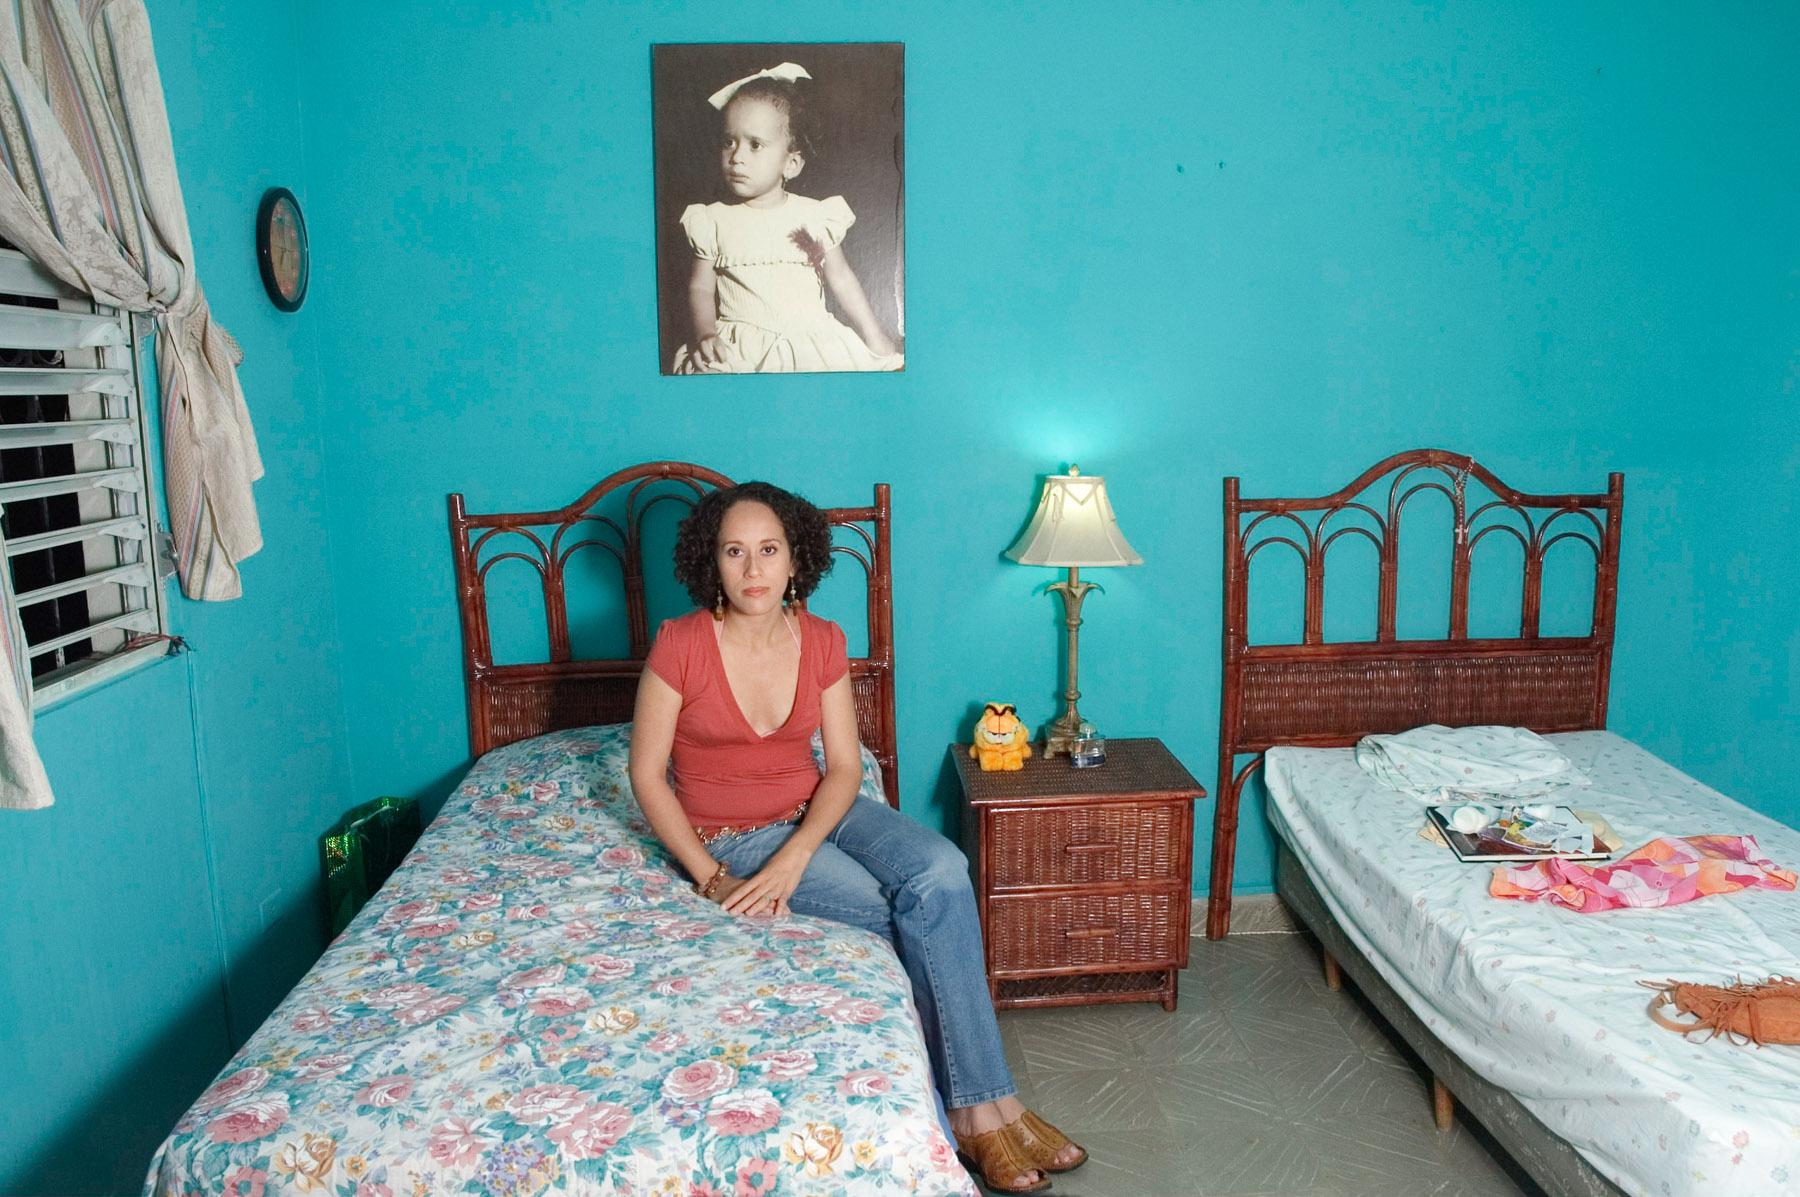 Laura Mercedes Perez Gross, 2006 Gazcue, Santo Domingo, R.D.